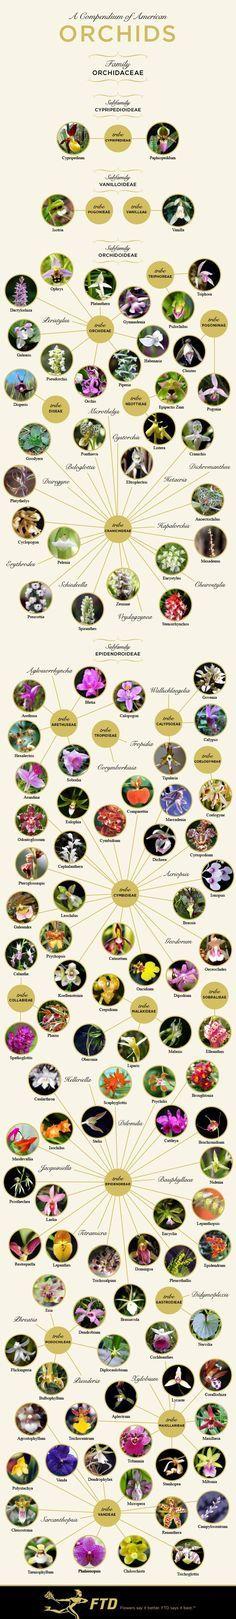 Types of Orchids: A Visual Compendium | Vanda orchids ...